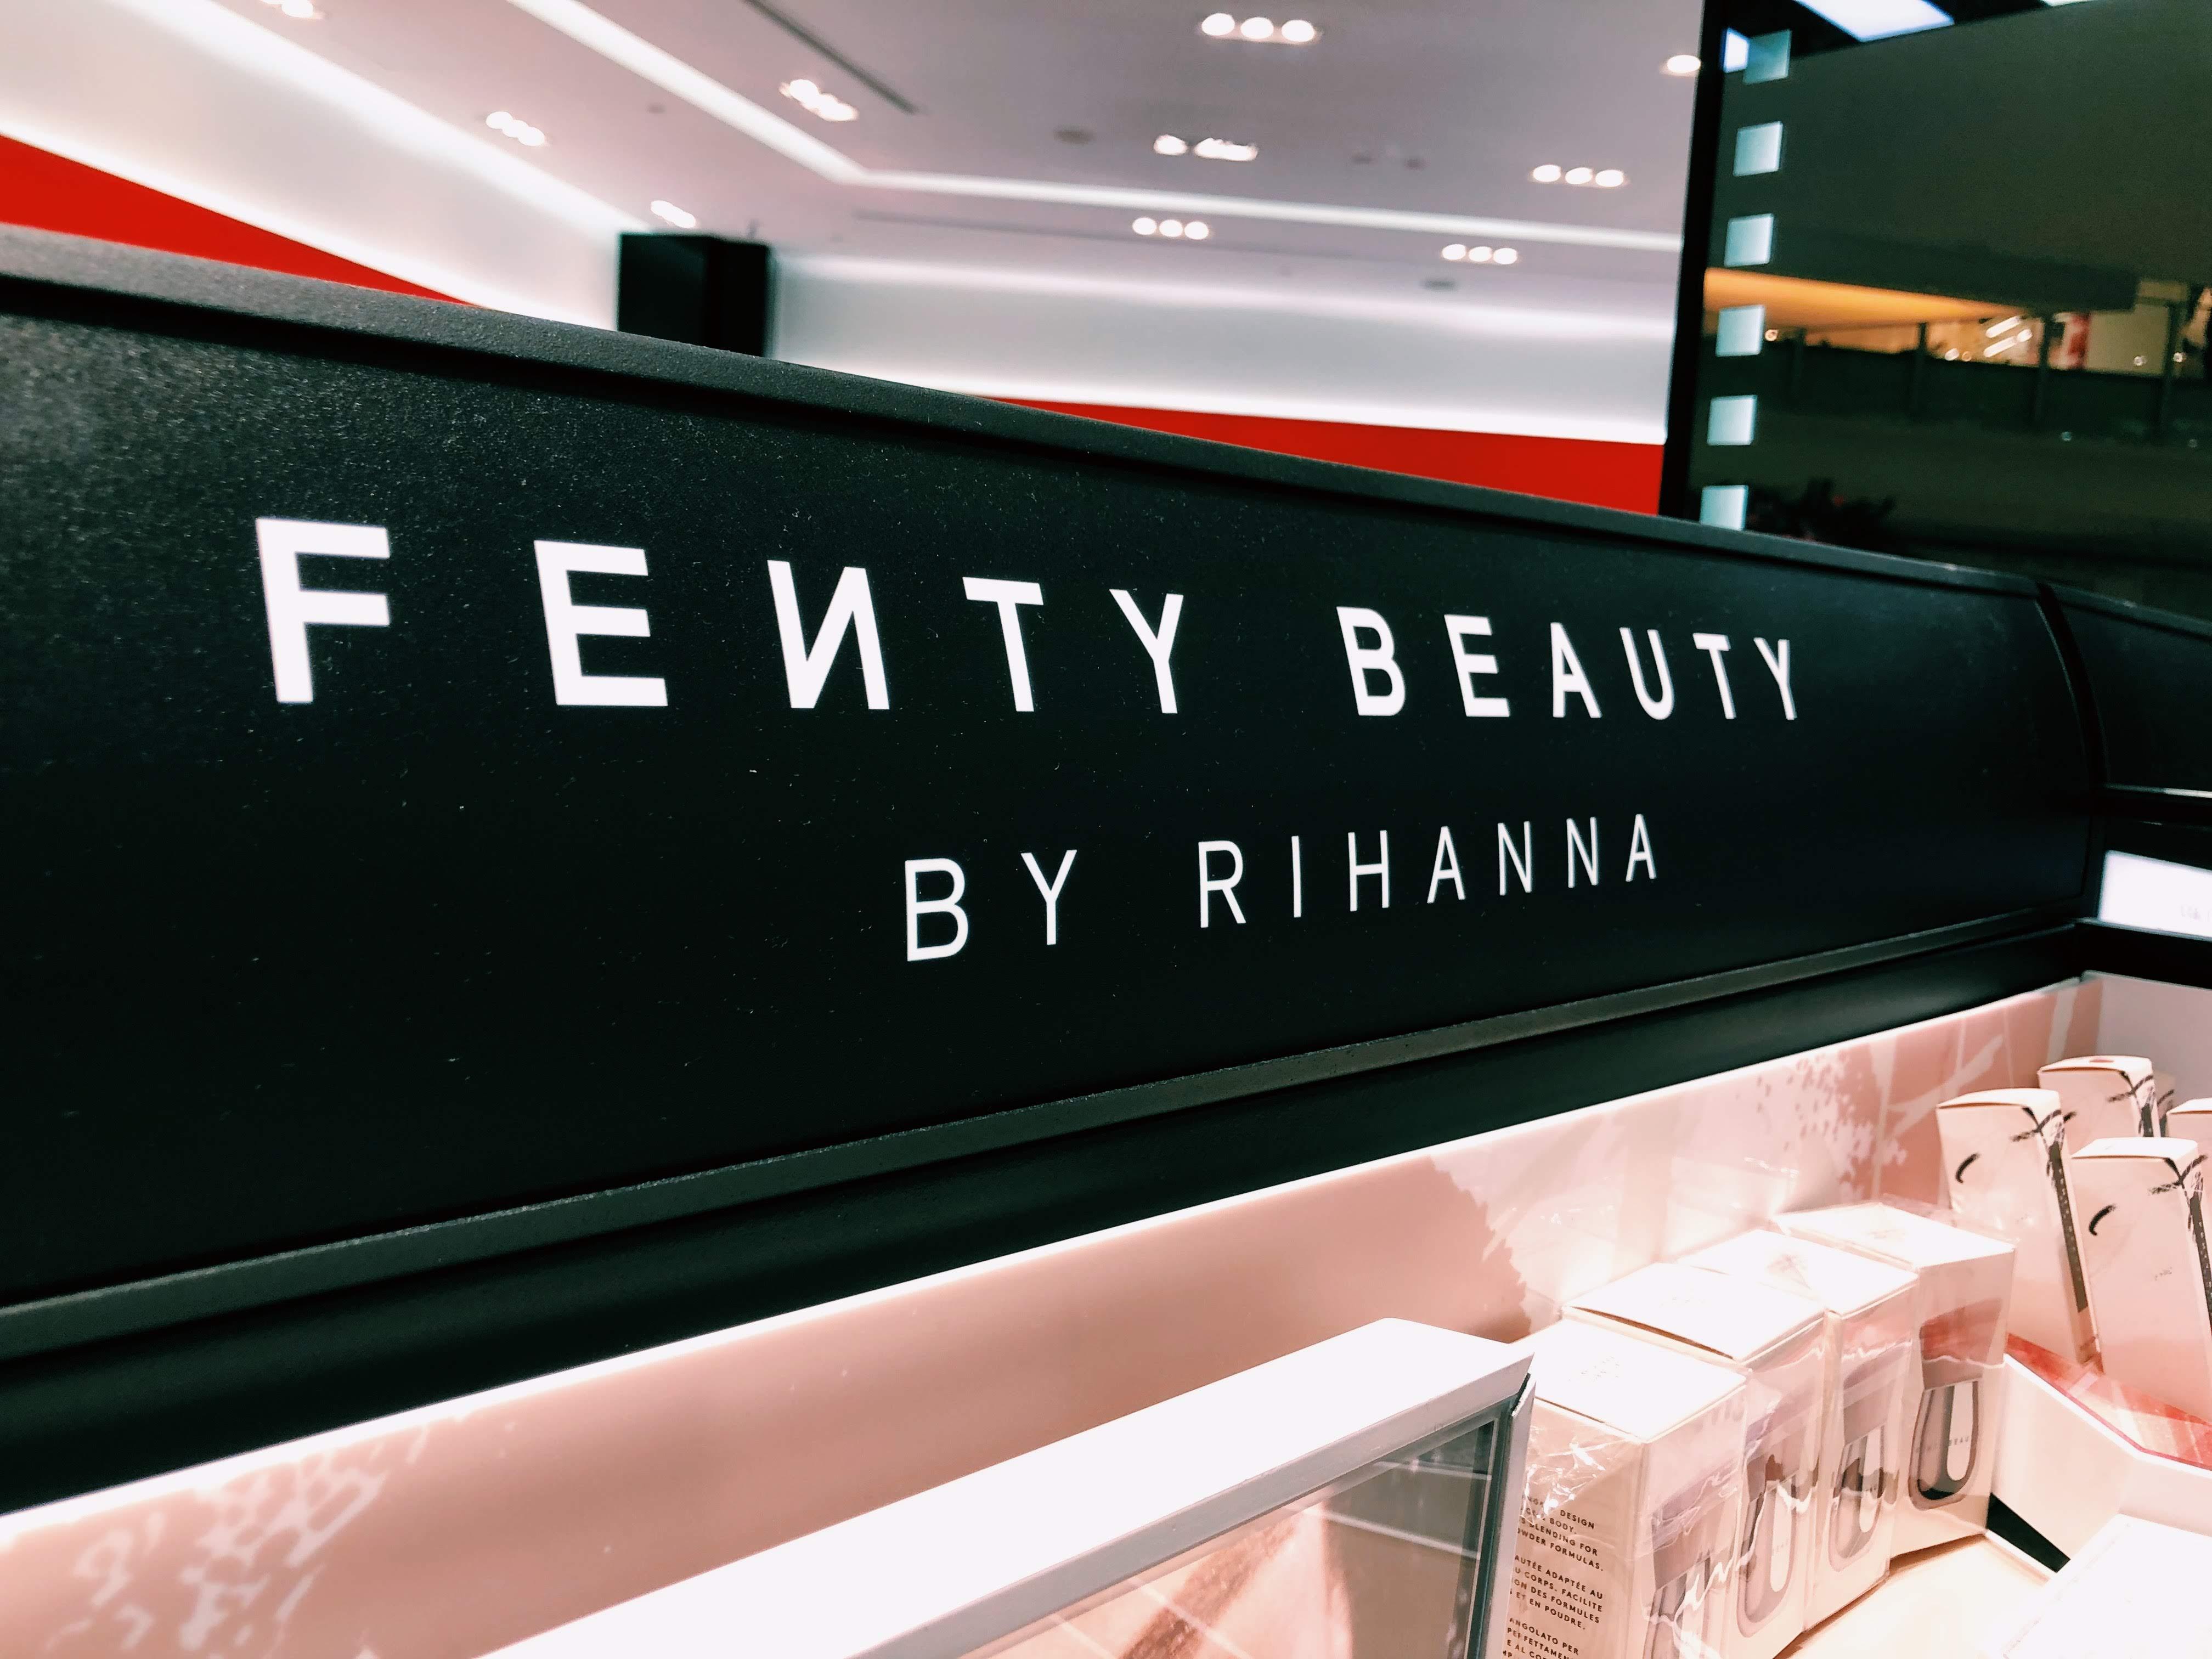 "Malaysia_BeautyTrip_FentyBeauty_015"""""